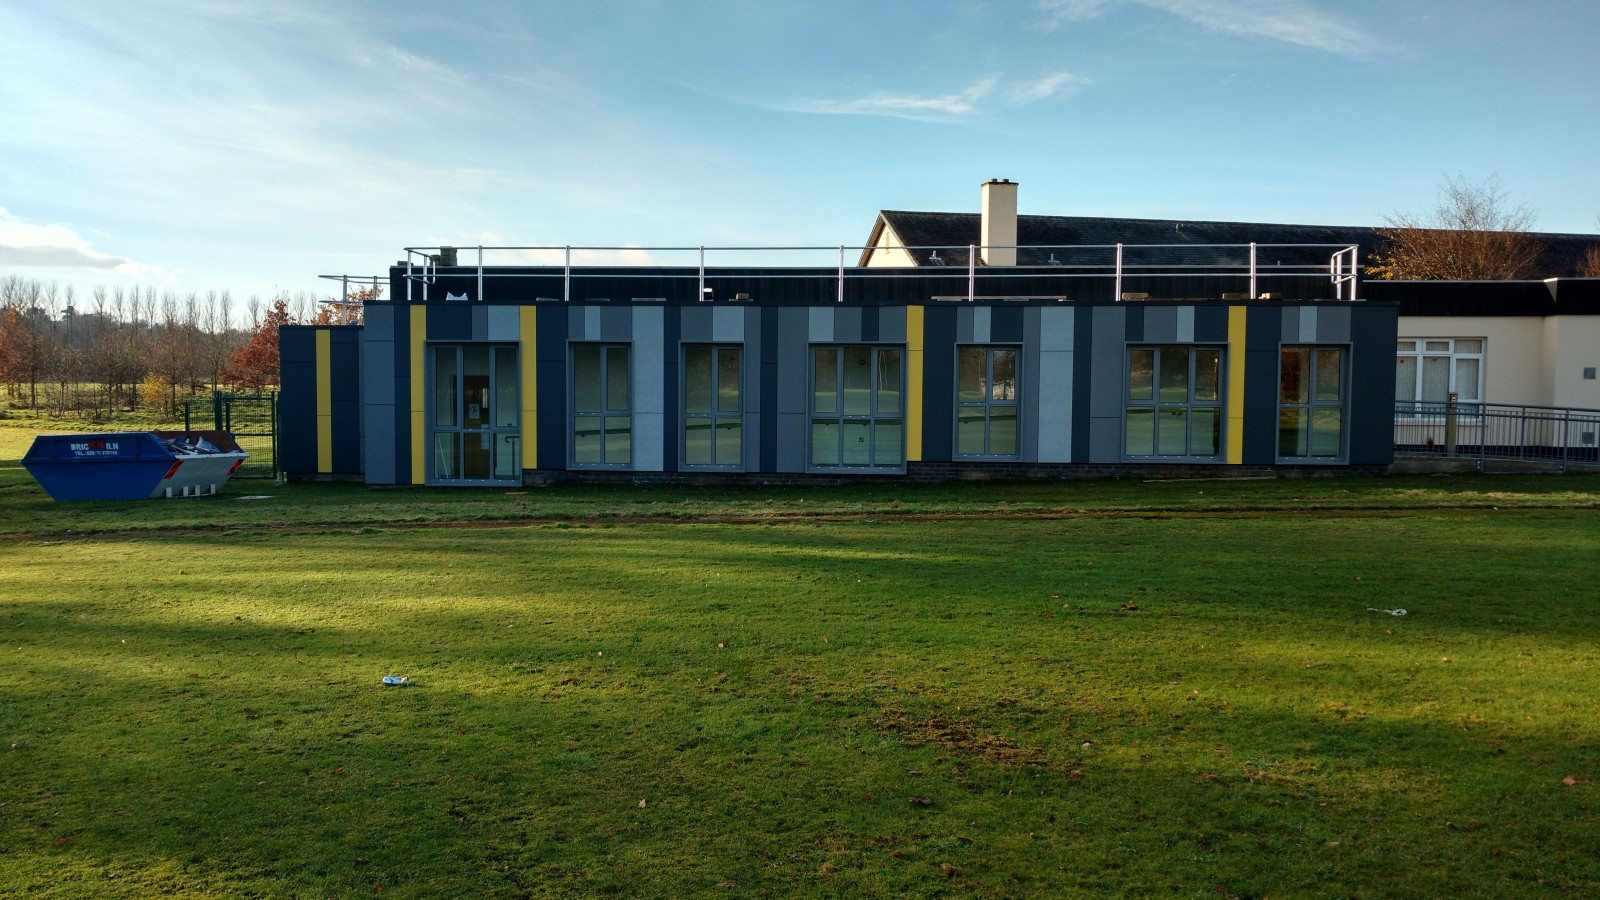 Woodlea House Gransha, Derry - Fibre Cement Cladding